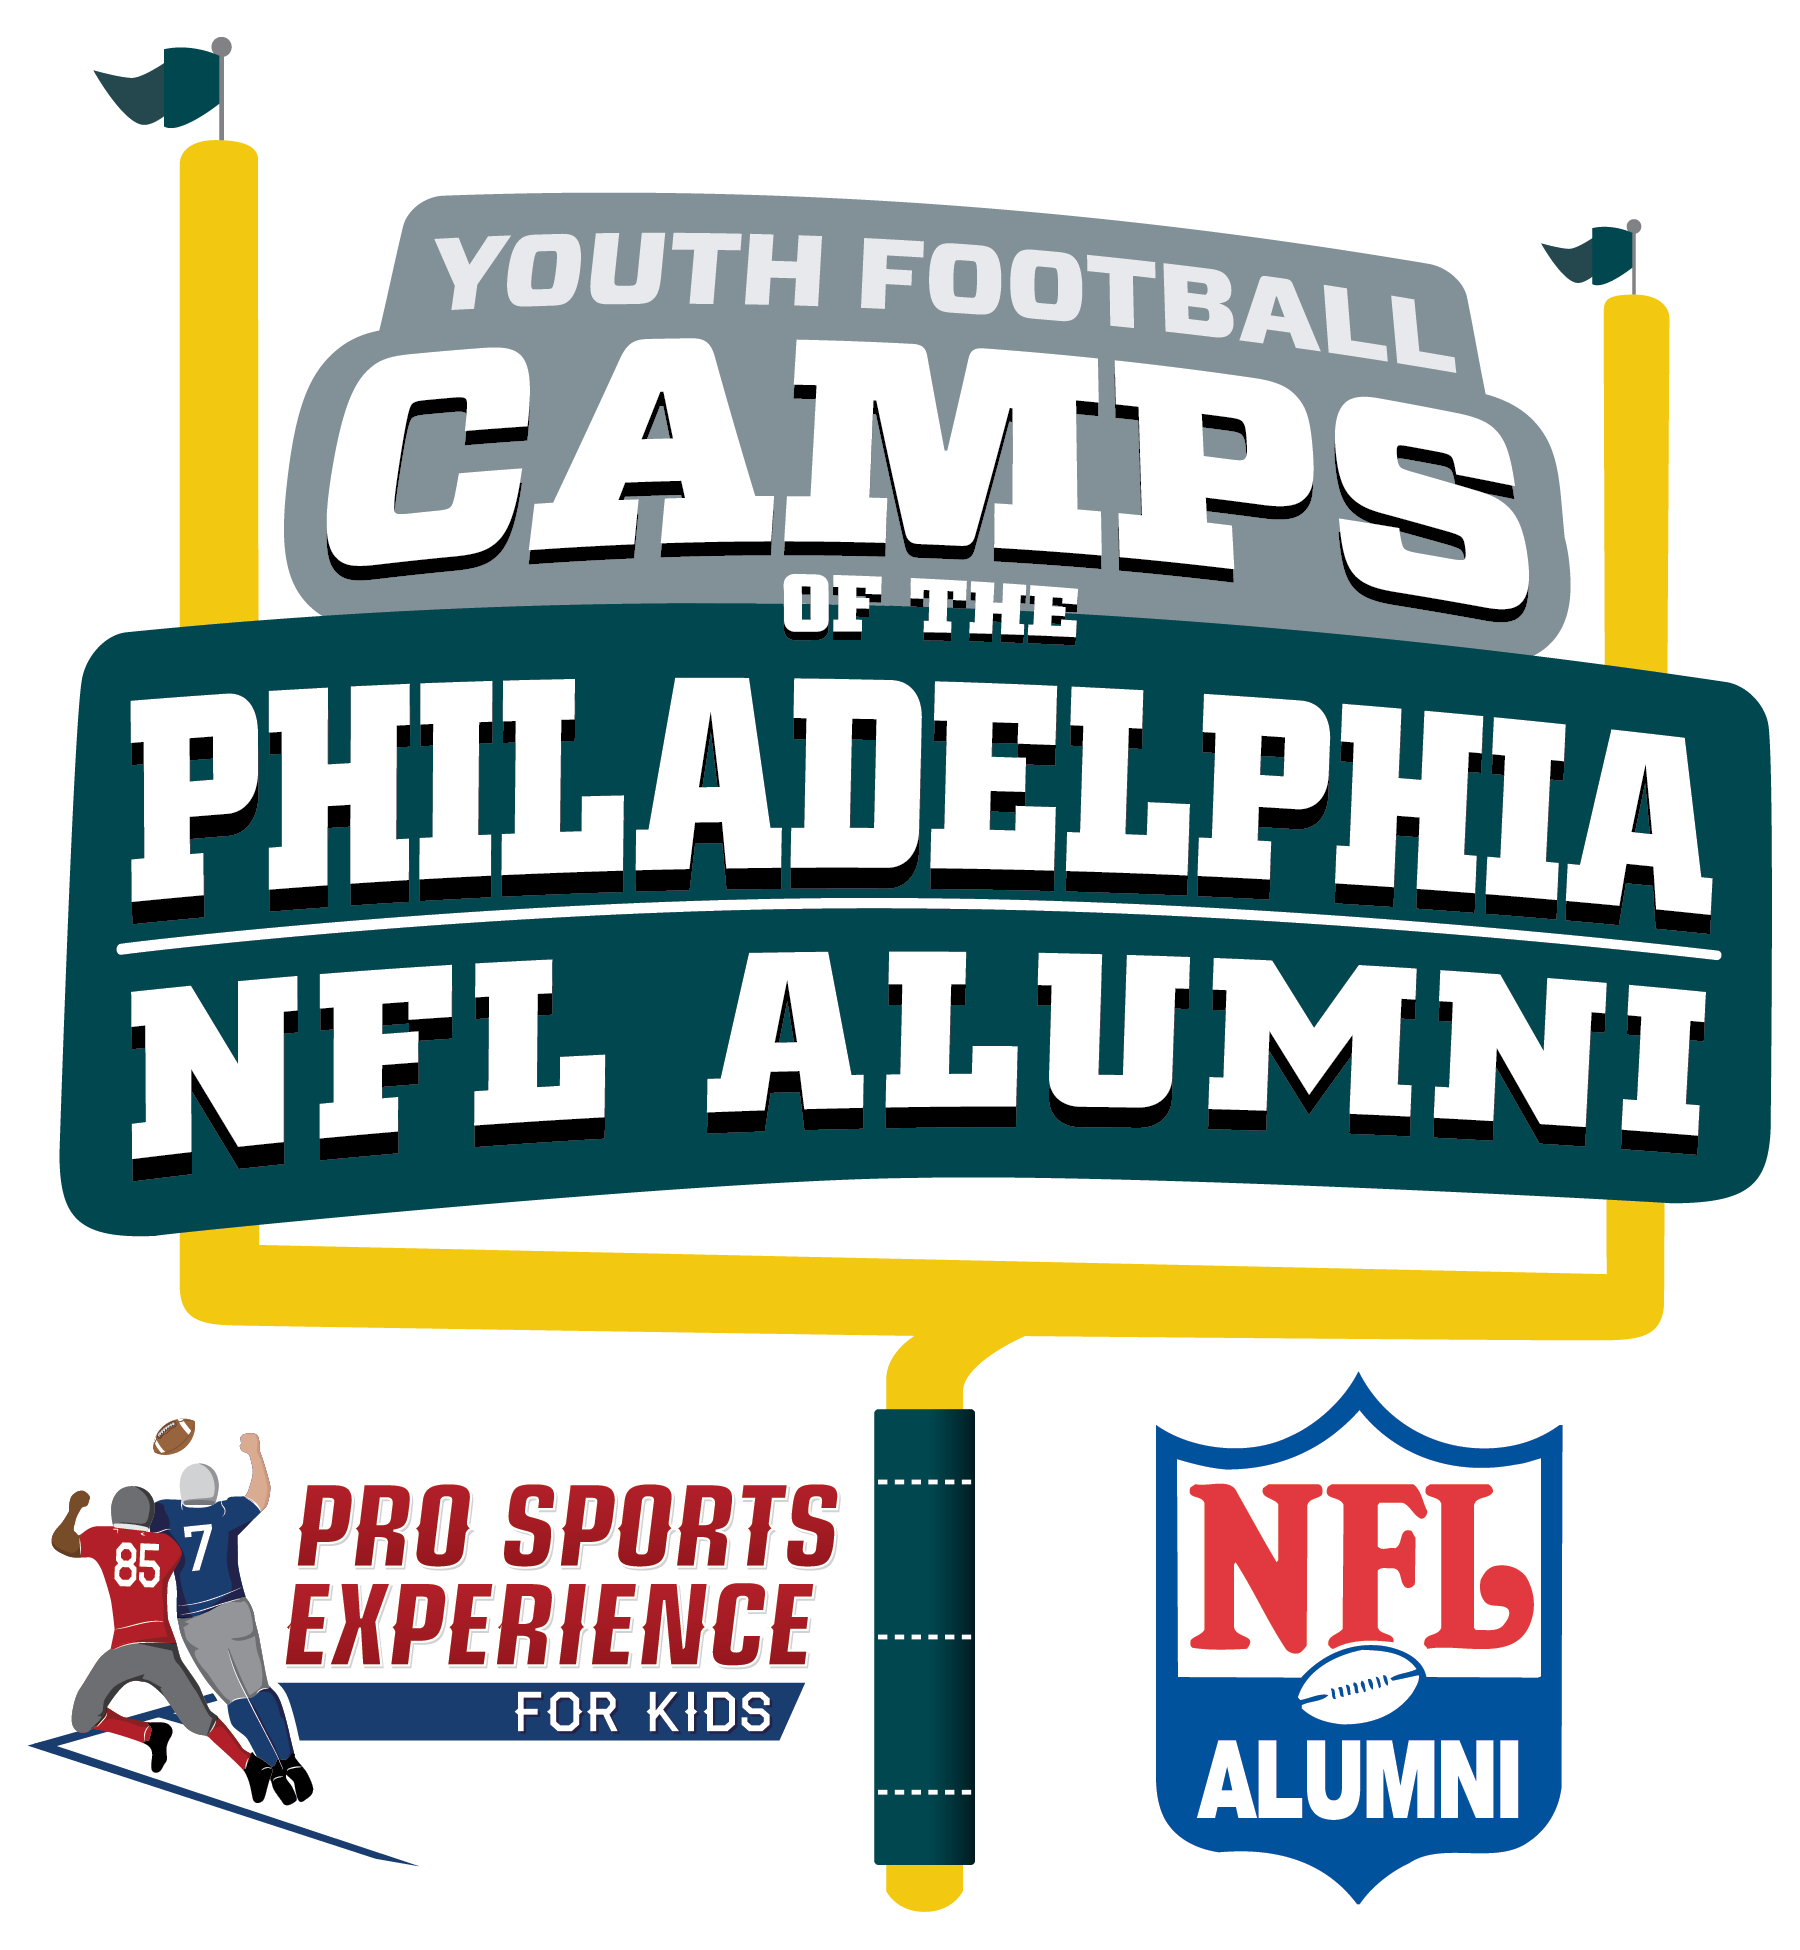 Philadelphia NFL Alumni Hero Youth Football Camps - Bethlehem